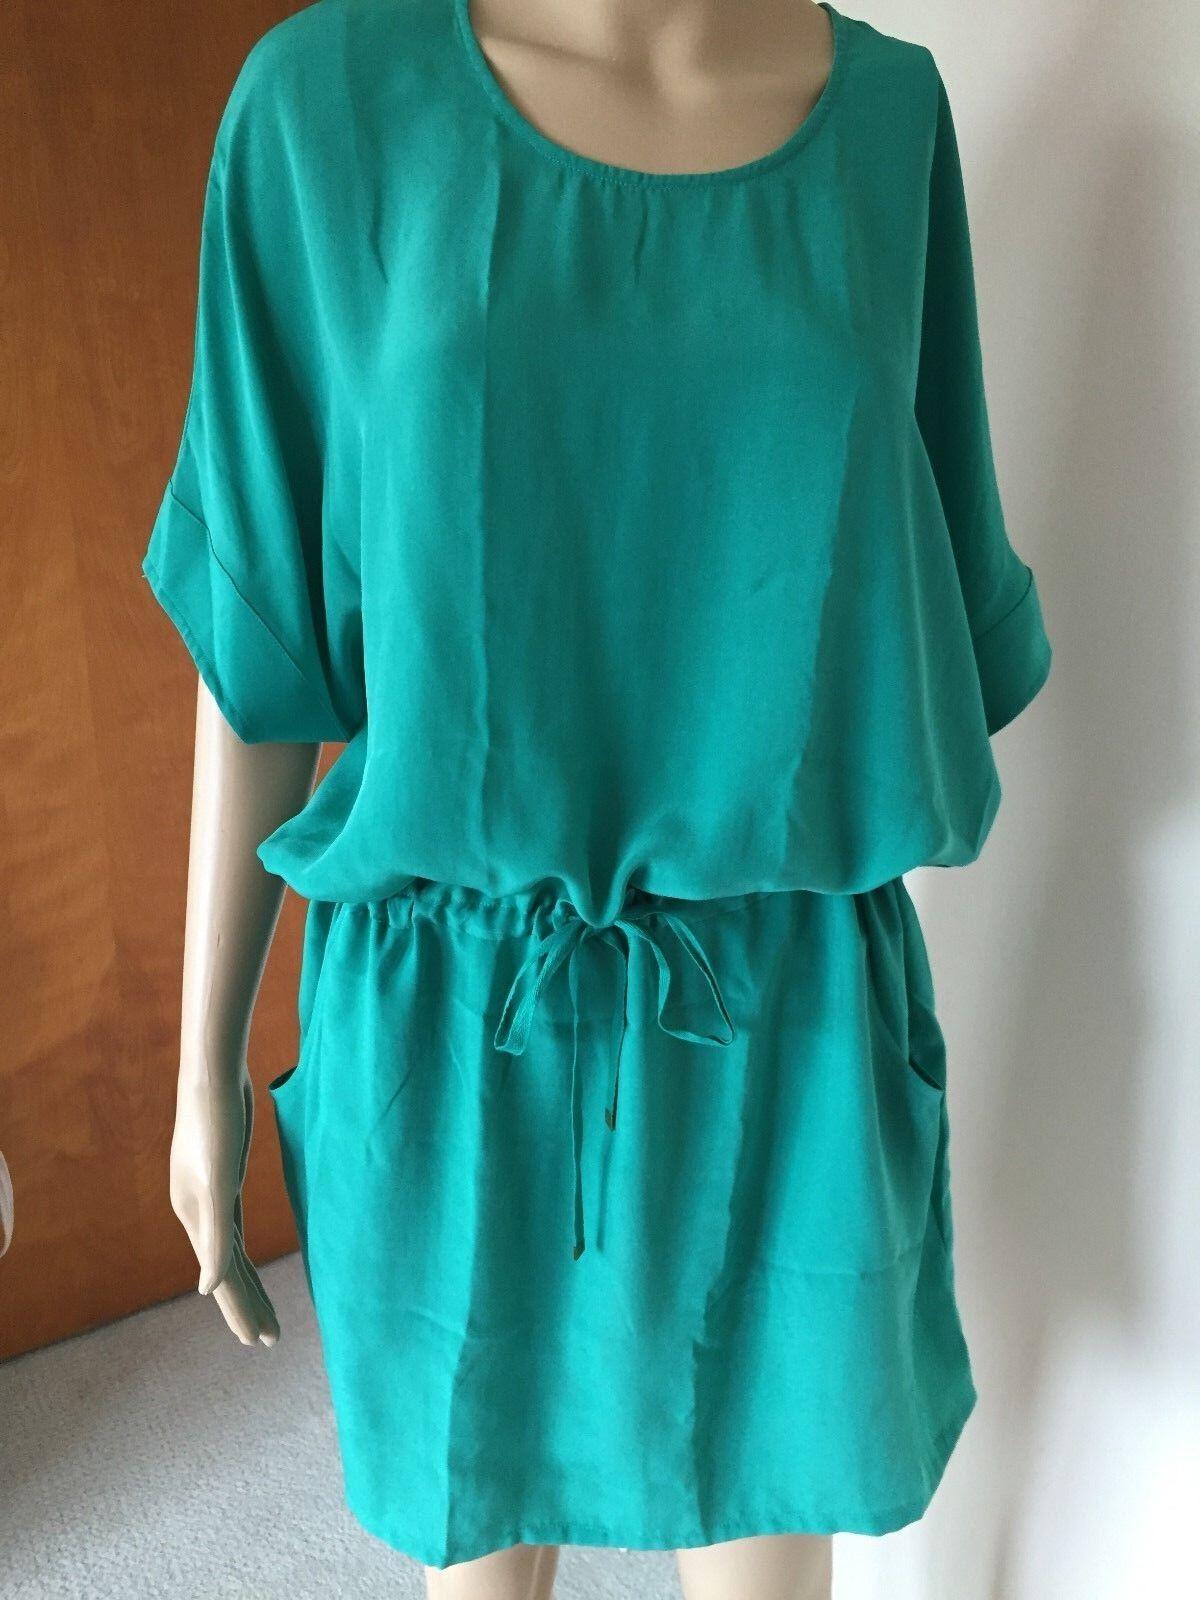 New Victoria's Secret, dress, Size M,  Green, poly